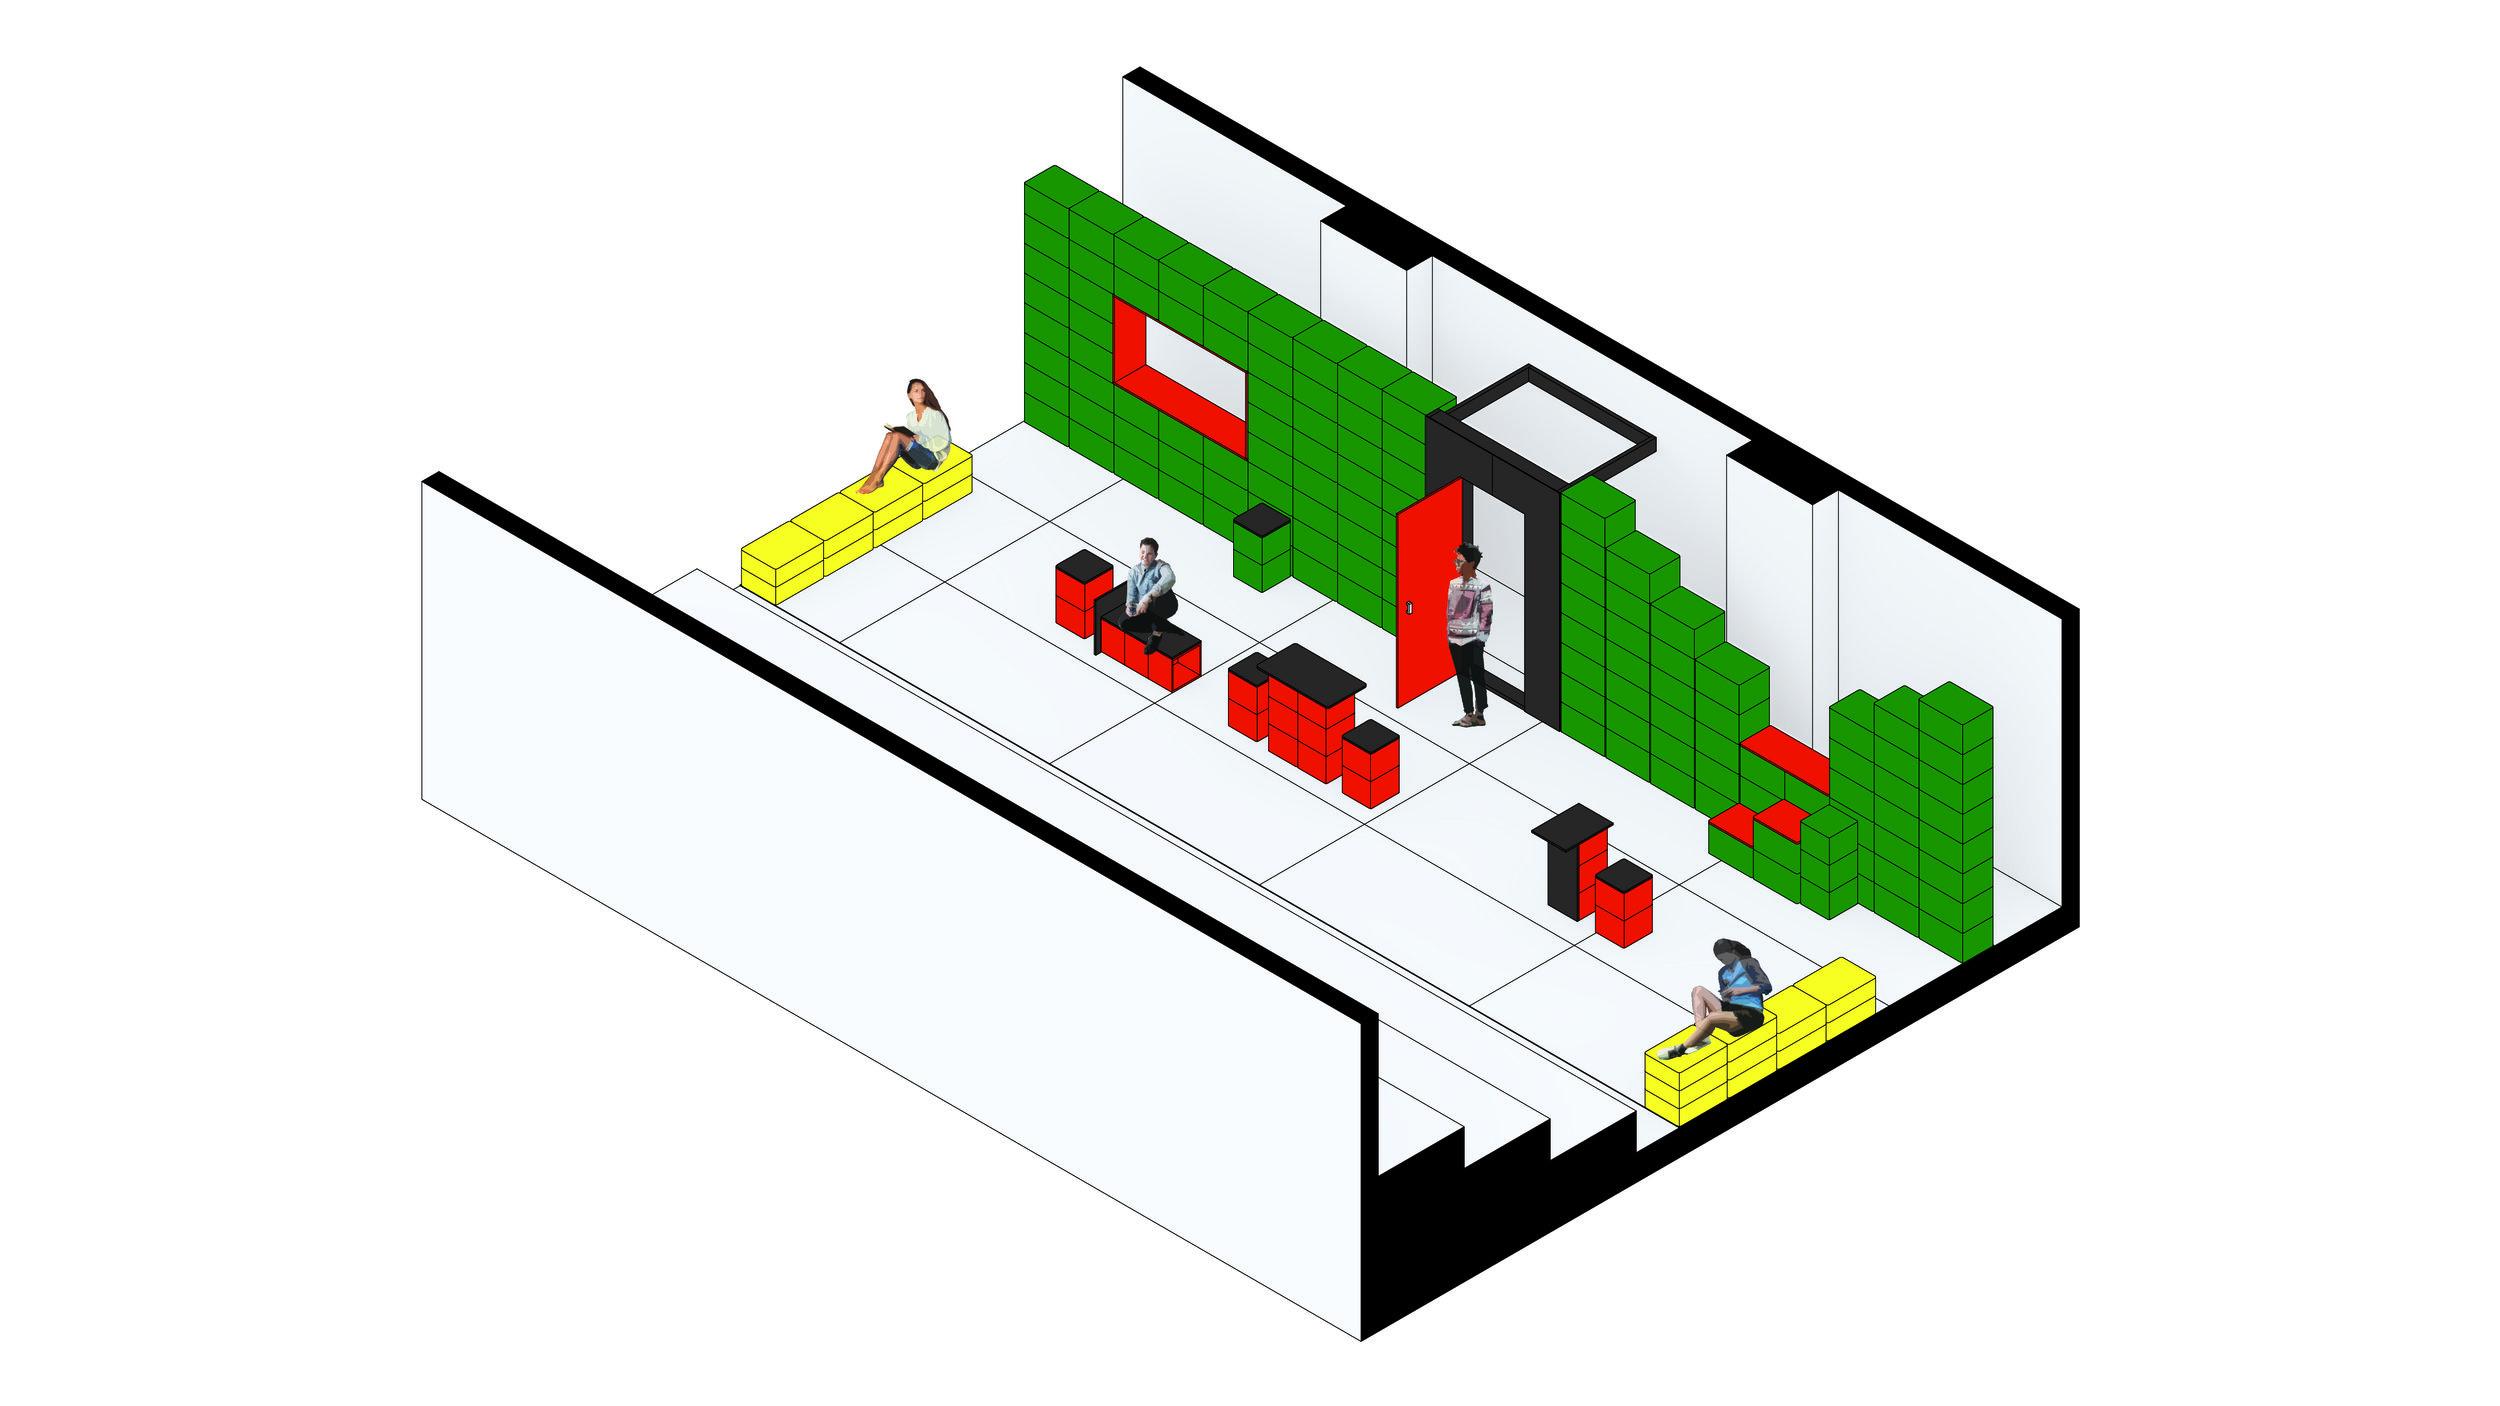 Schematic Design_ Axonometric Drawing